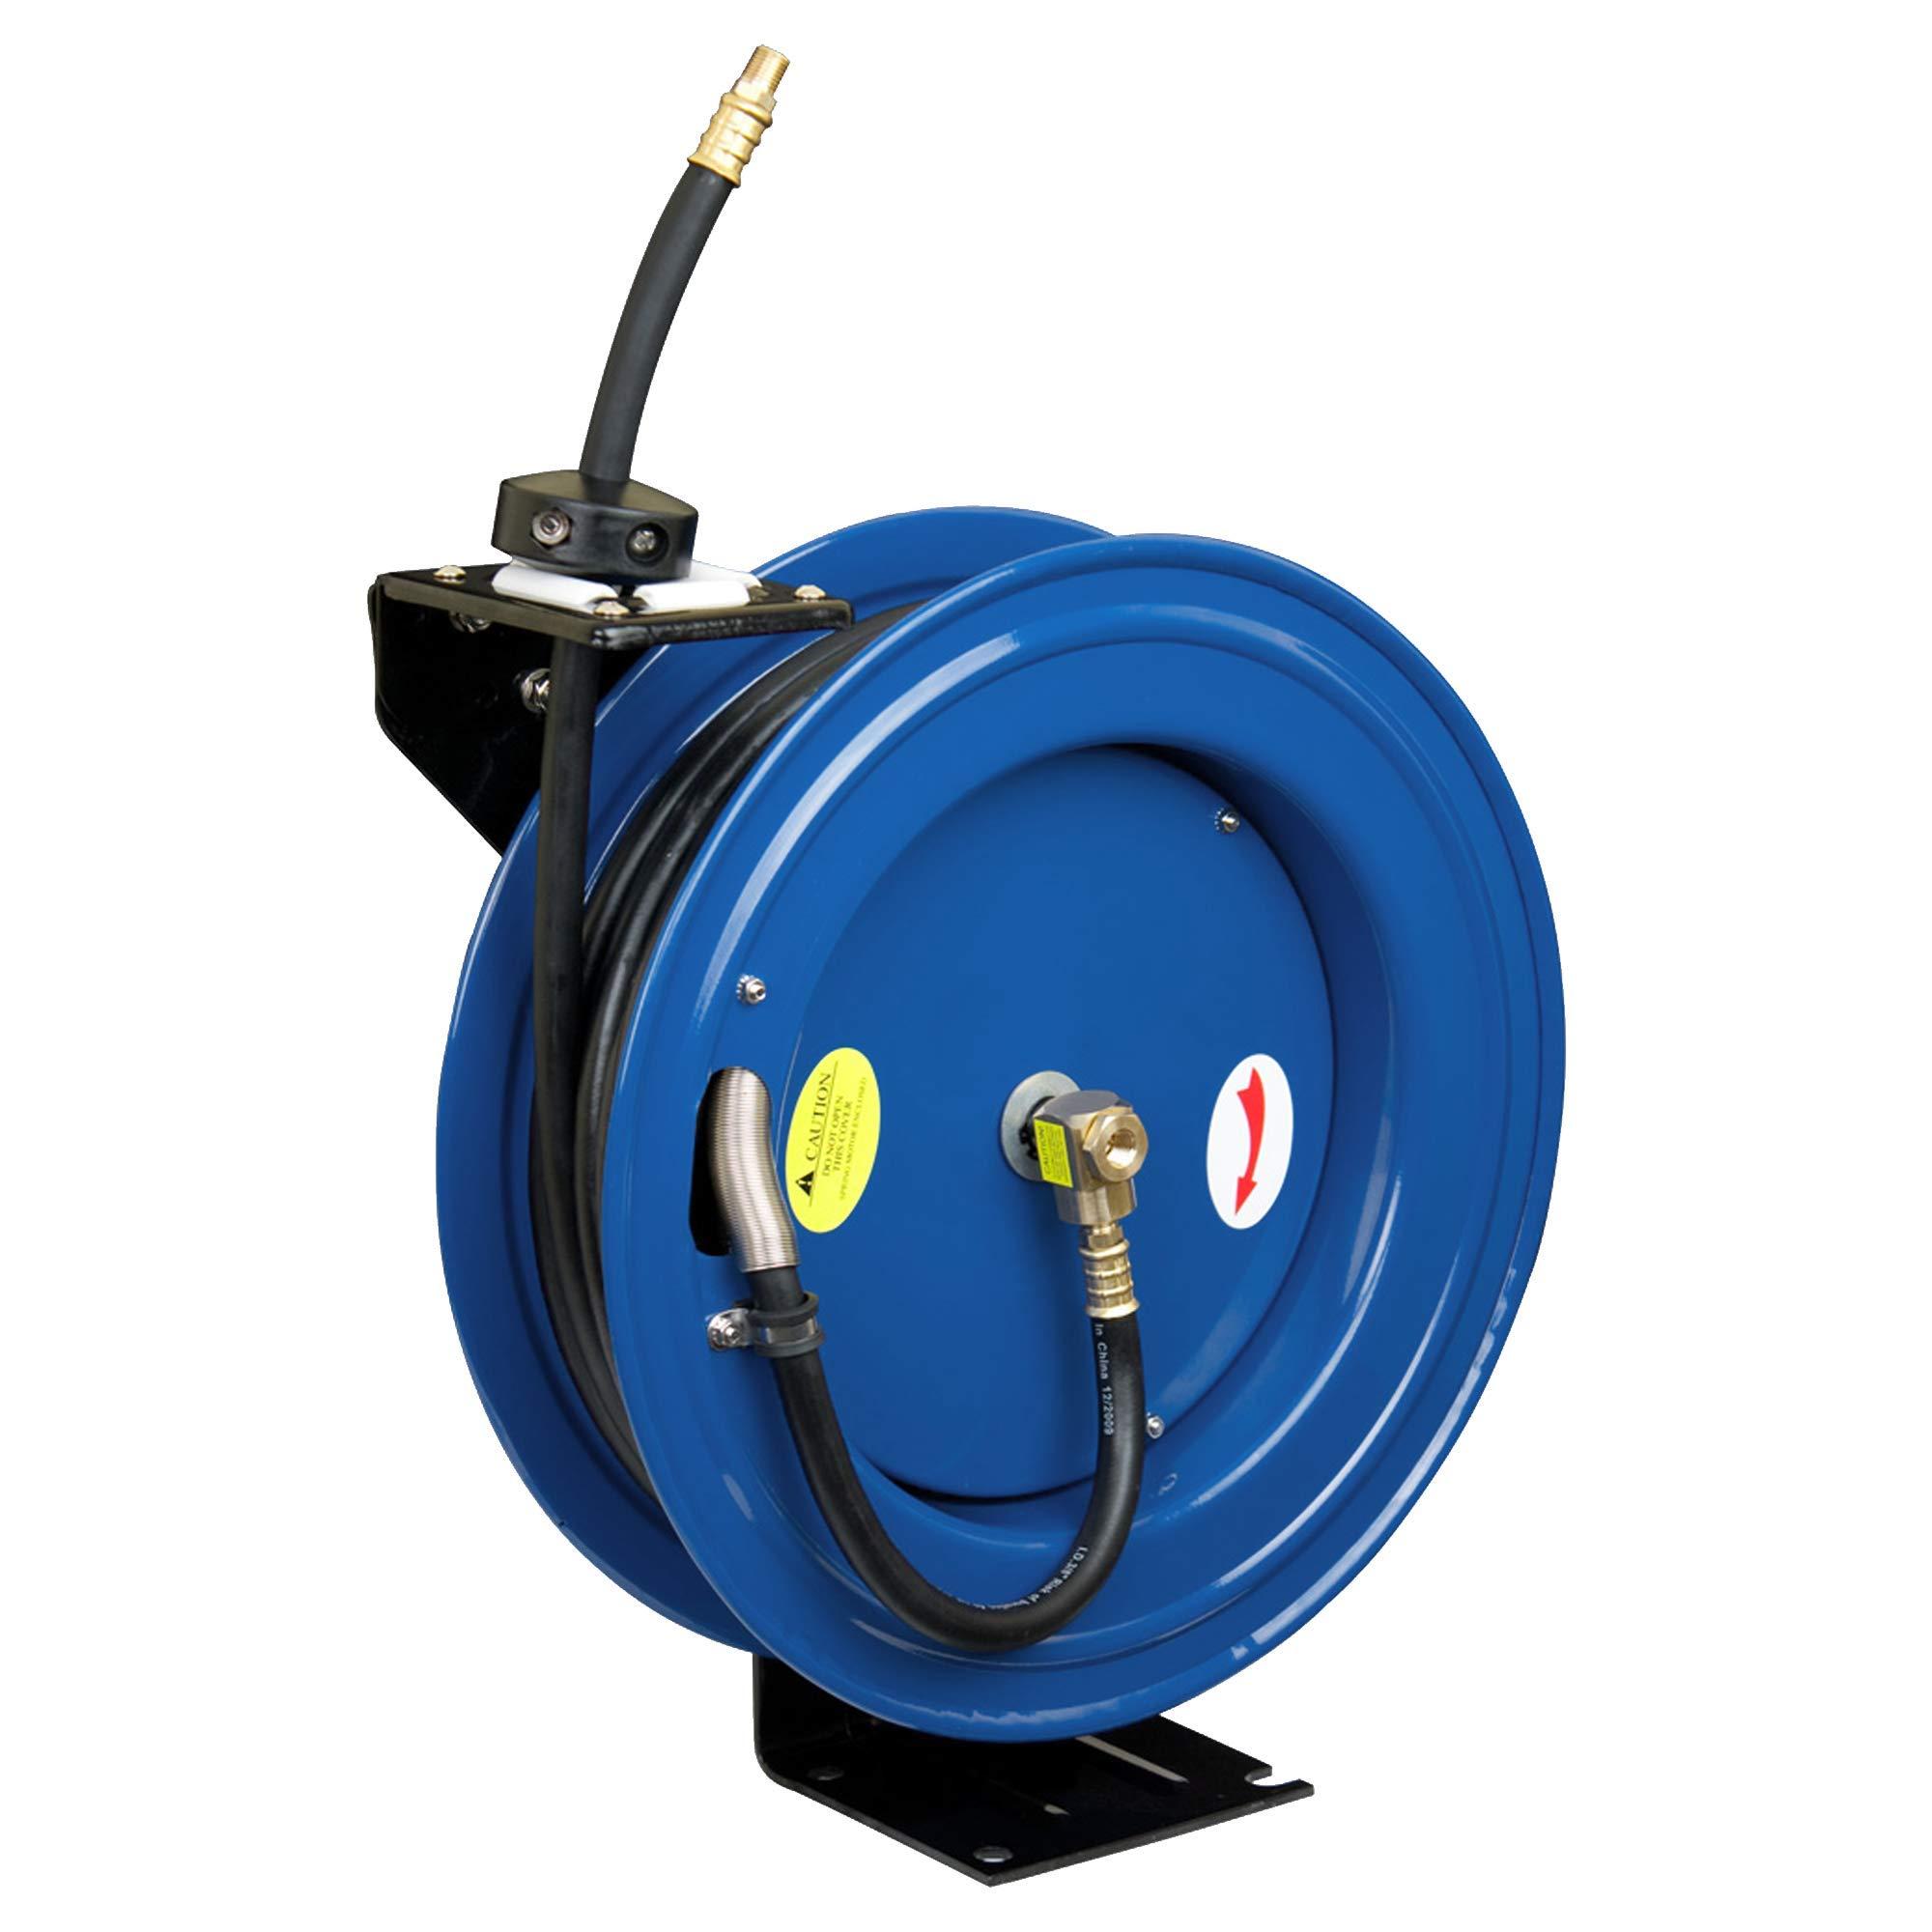 Cyclone Pneumatic CP3690 Retracable Air Hose Reel, Blue